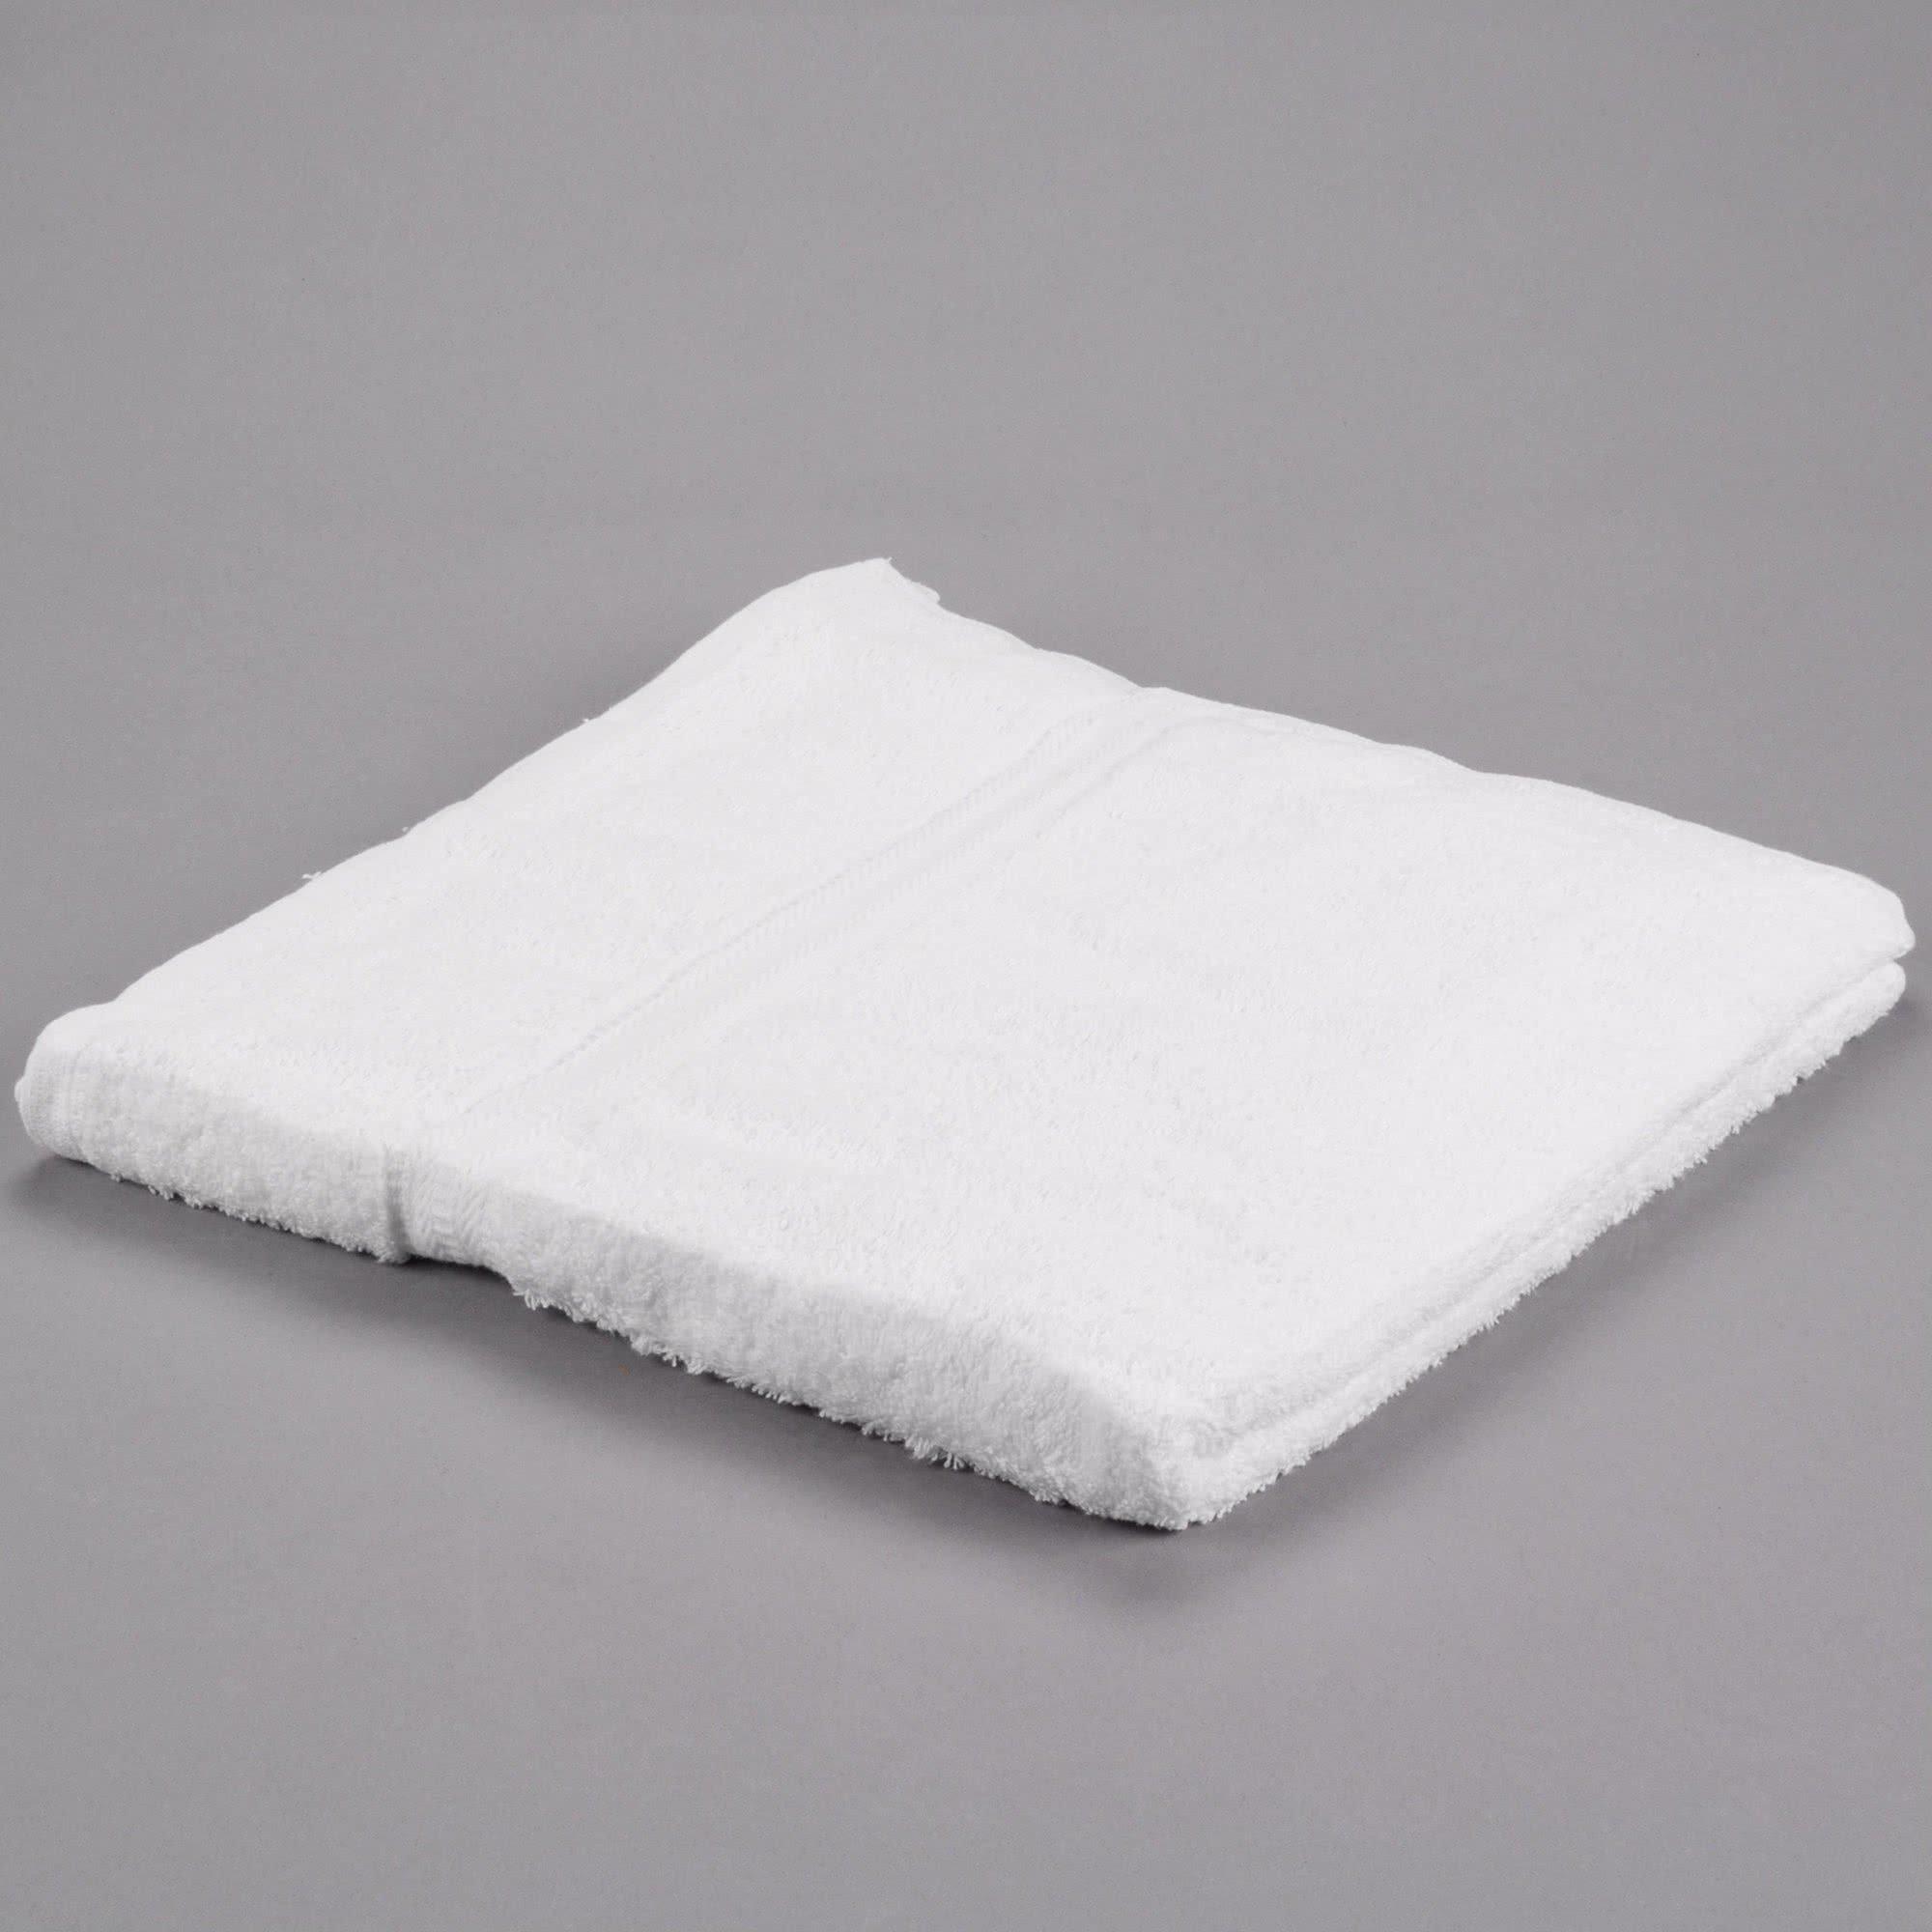 TableTop King 27'' x 54'' 100% Ring Spun Cotton Hotel Bath Towel 17 lb. - 12/Pack